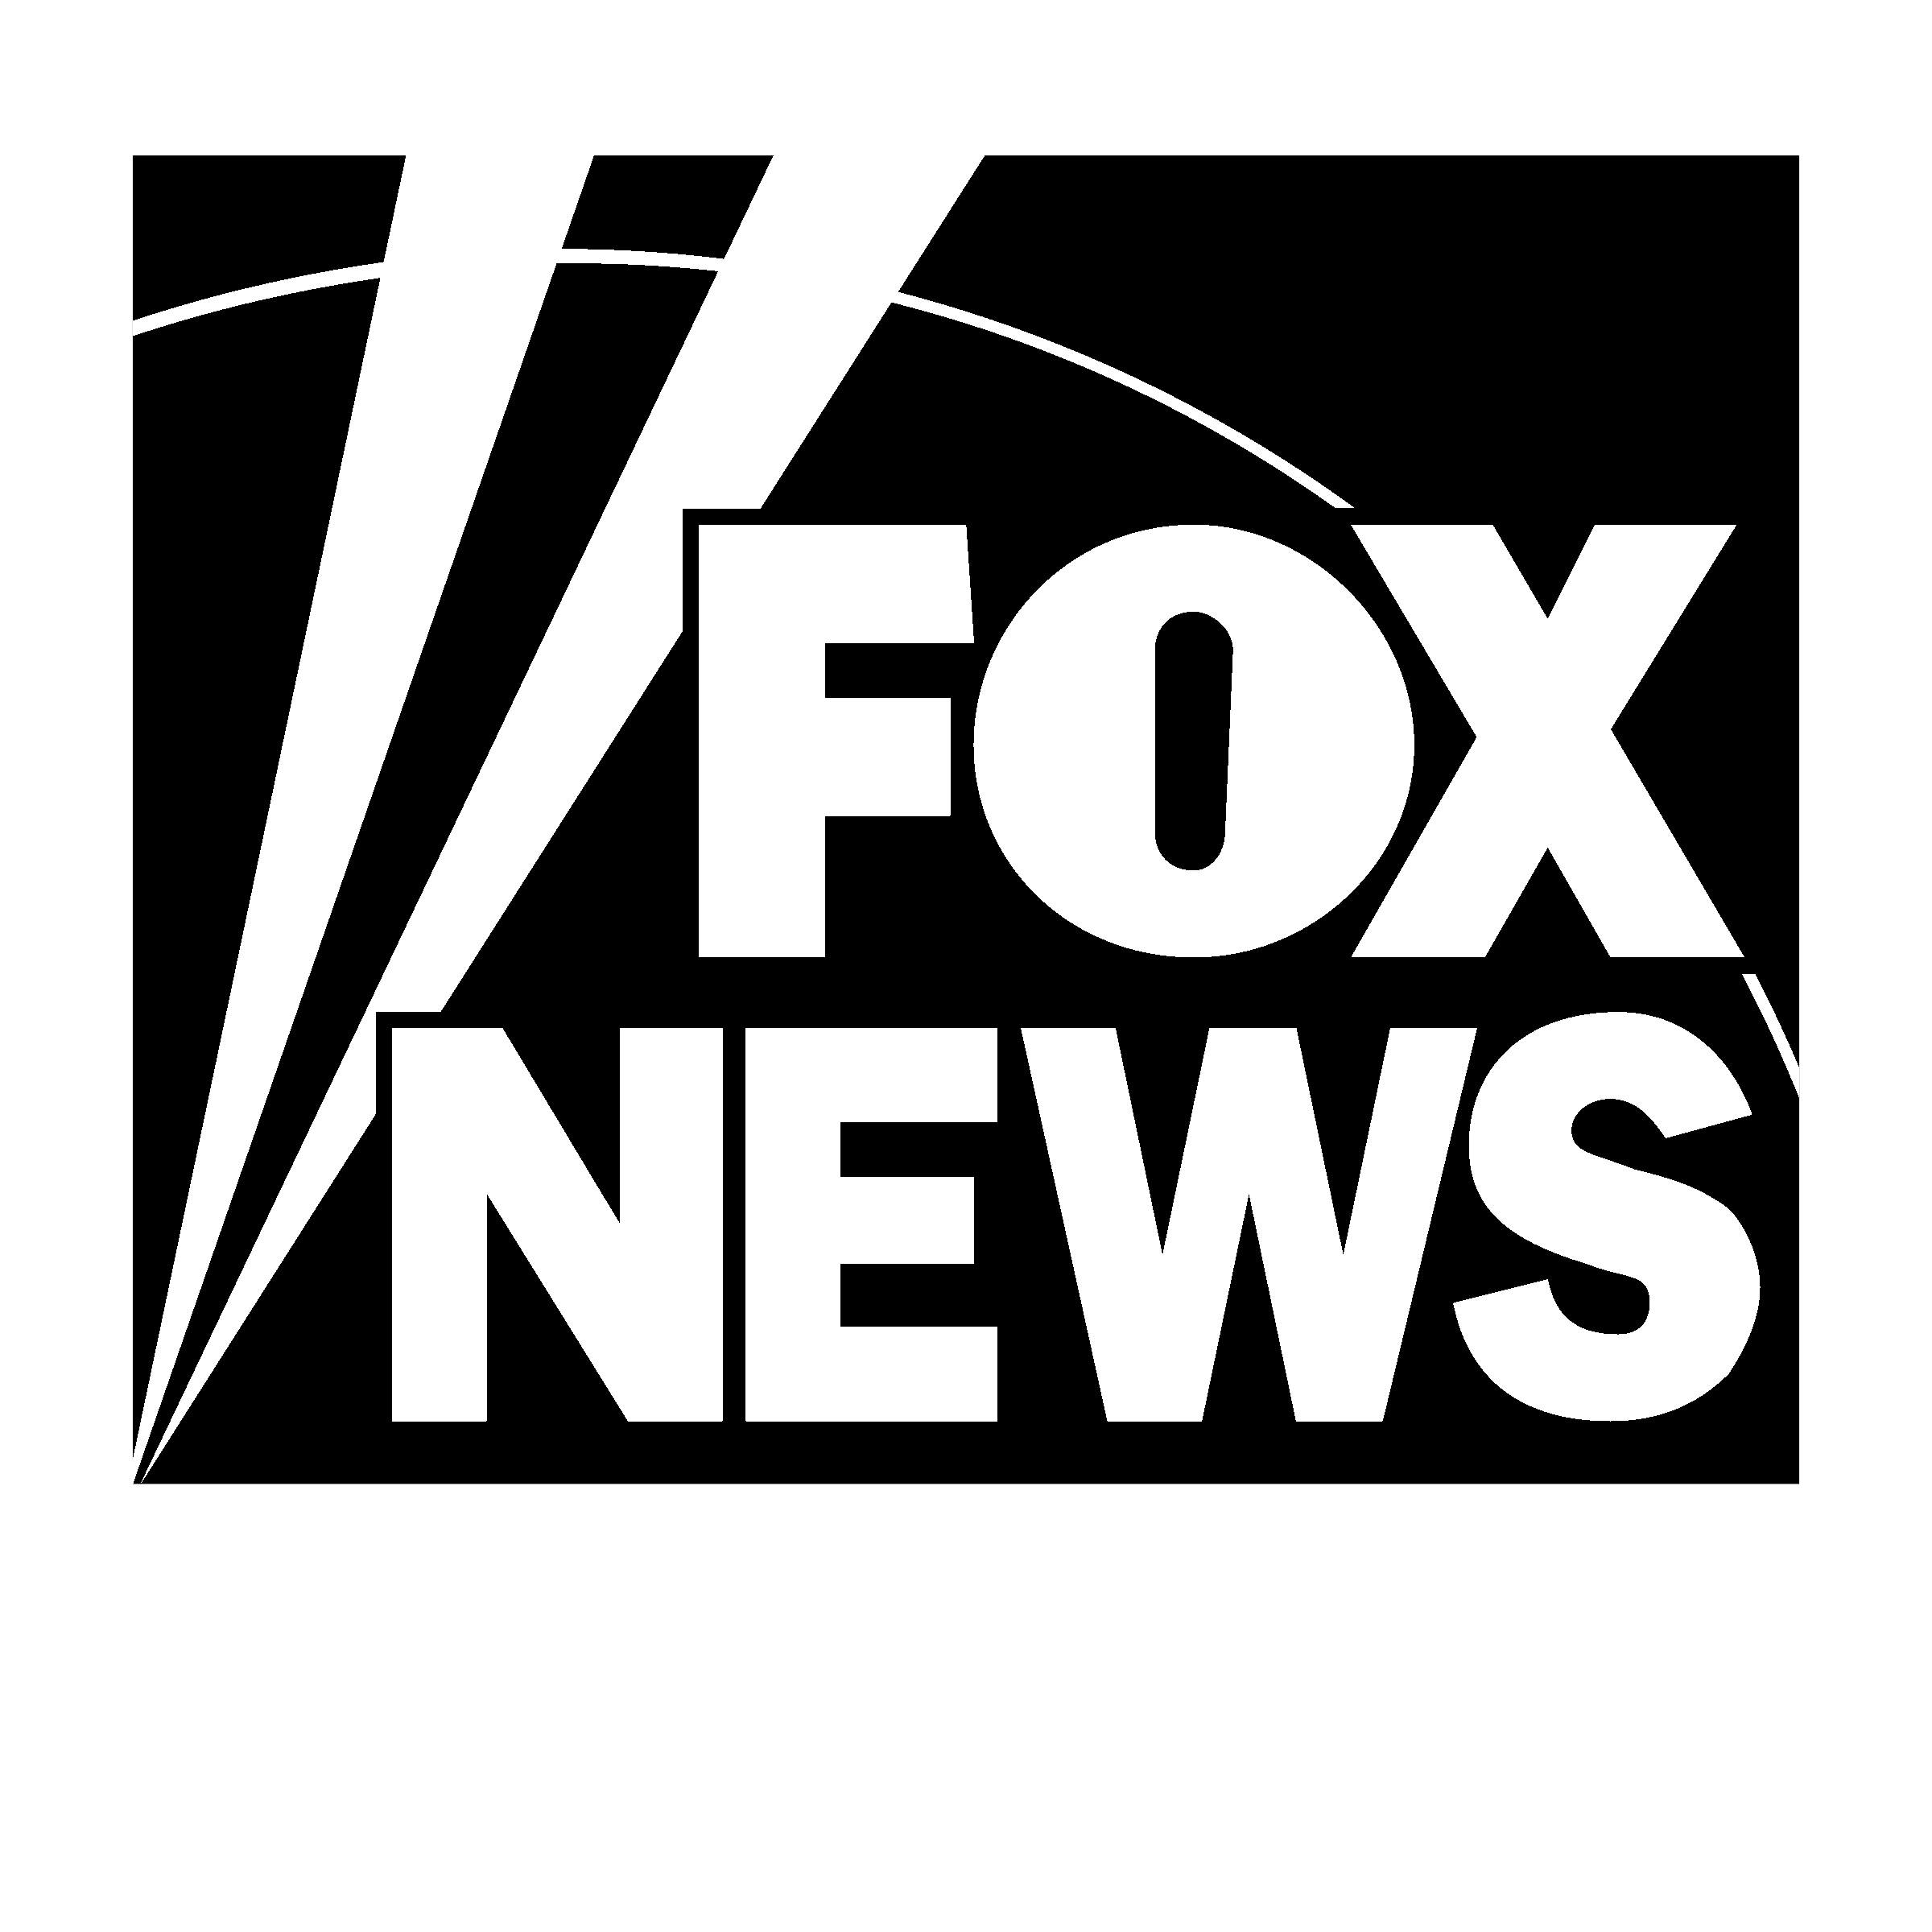 fox-news-logo-black-and-white.png